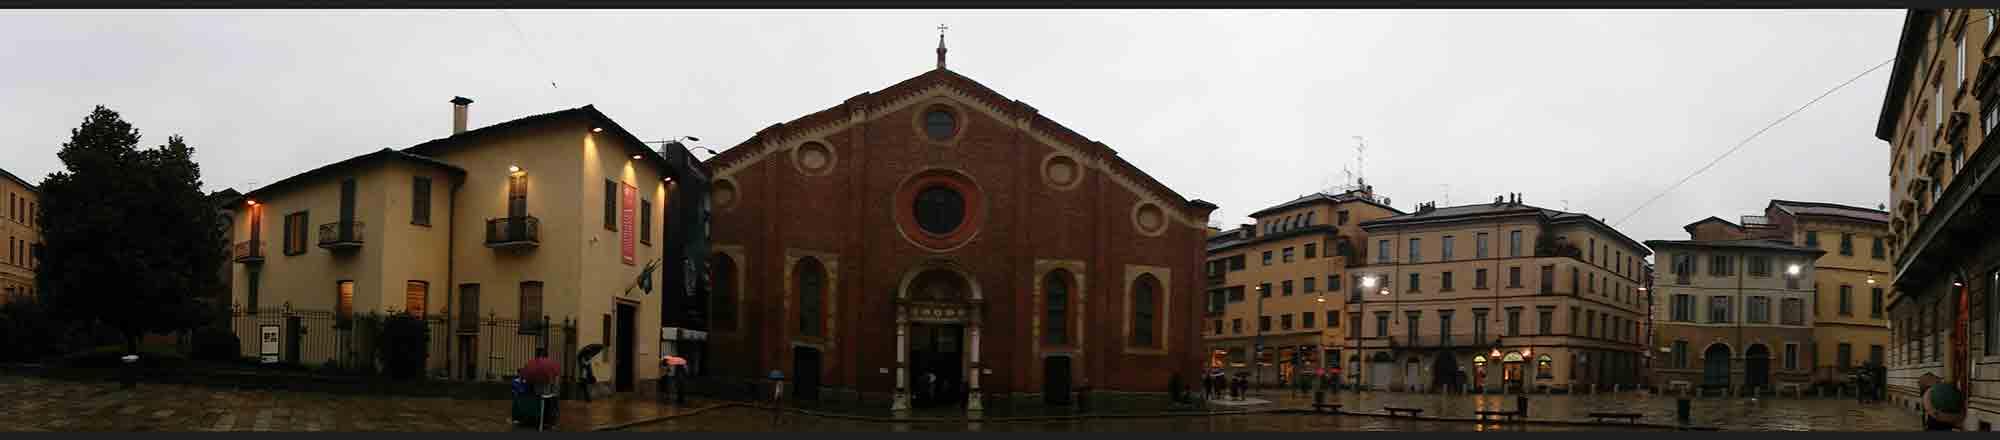 Basílica Santa Maria delle Grazie - Milão